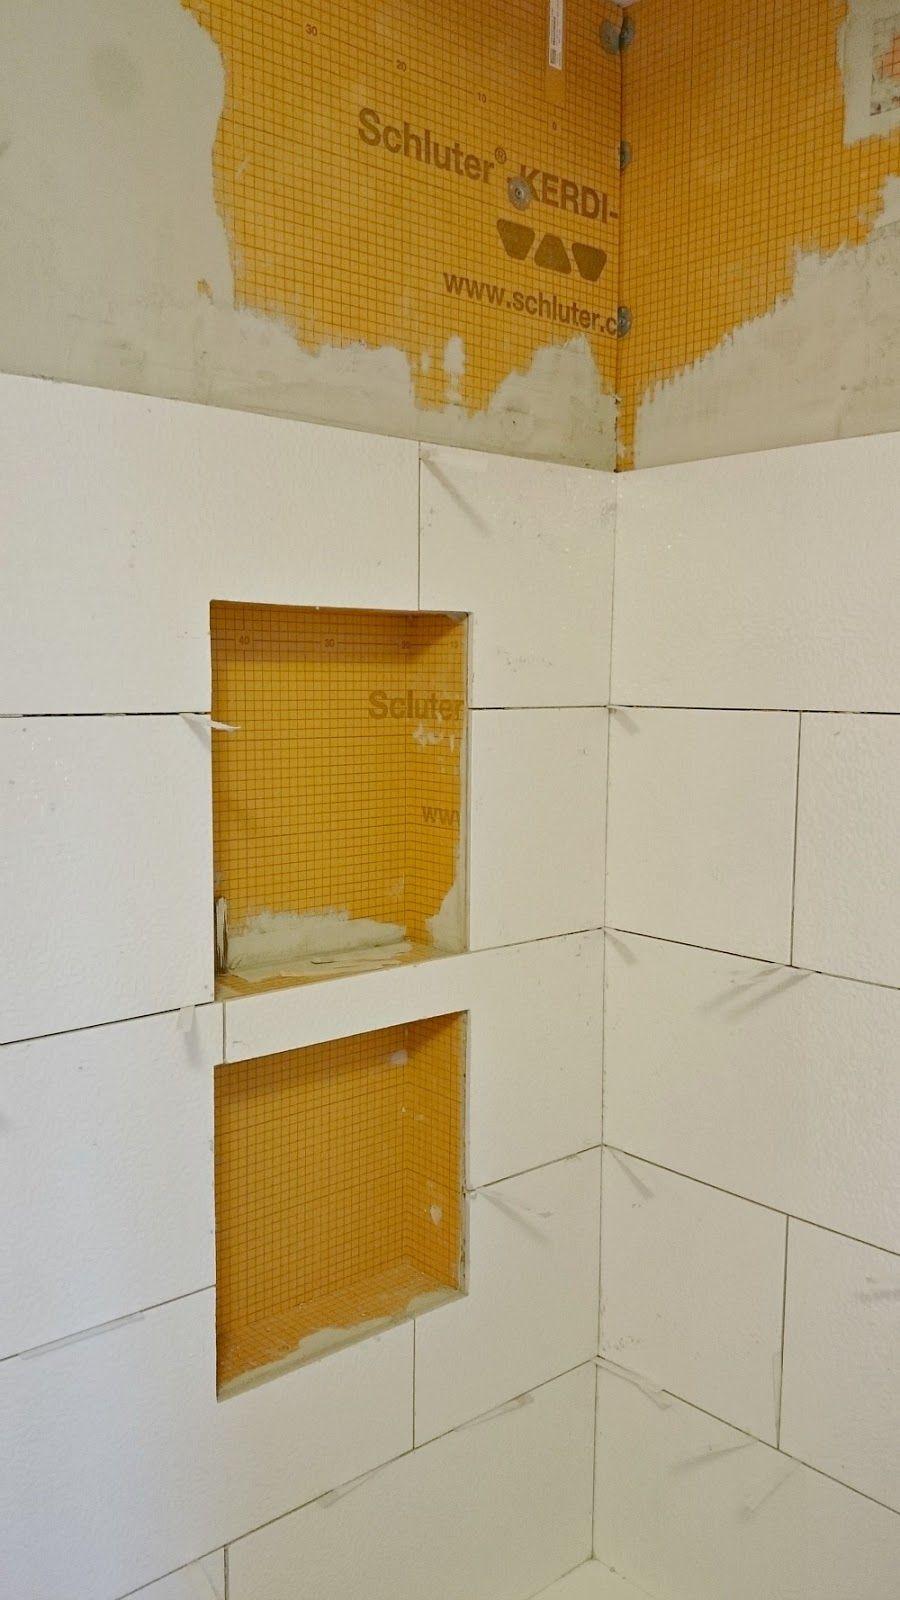 Installing Tile With Schluter Kerdi Board Shower Niche With Shelf